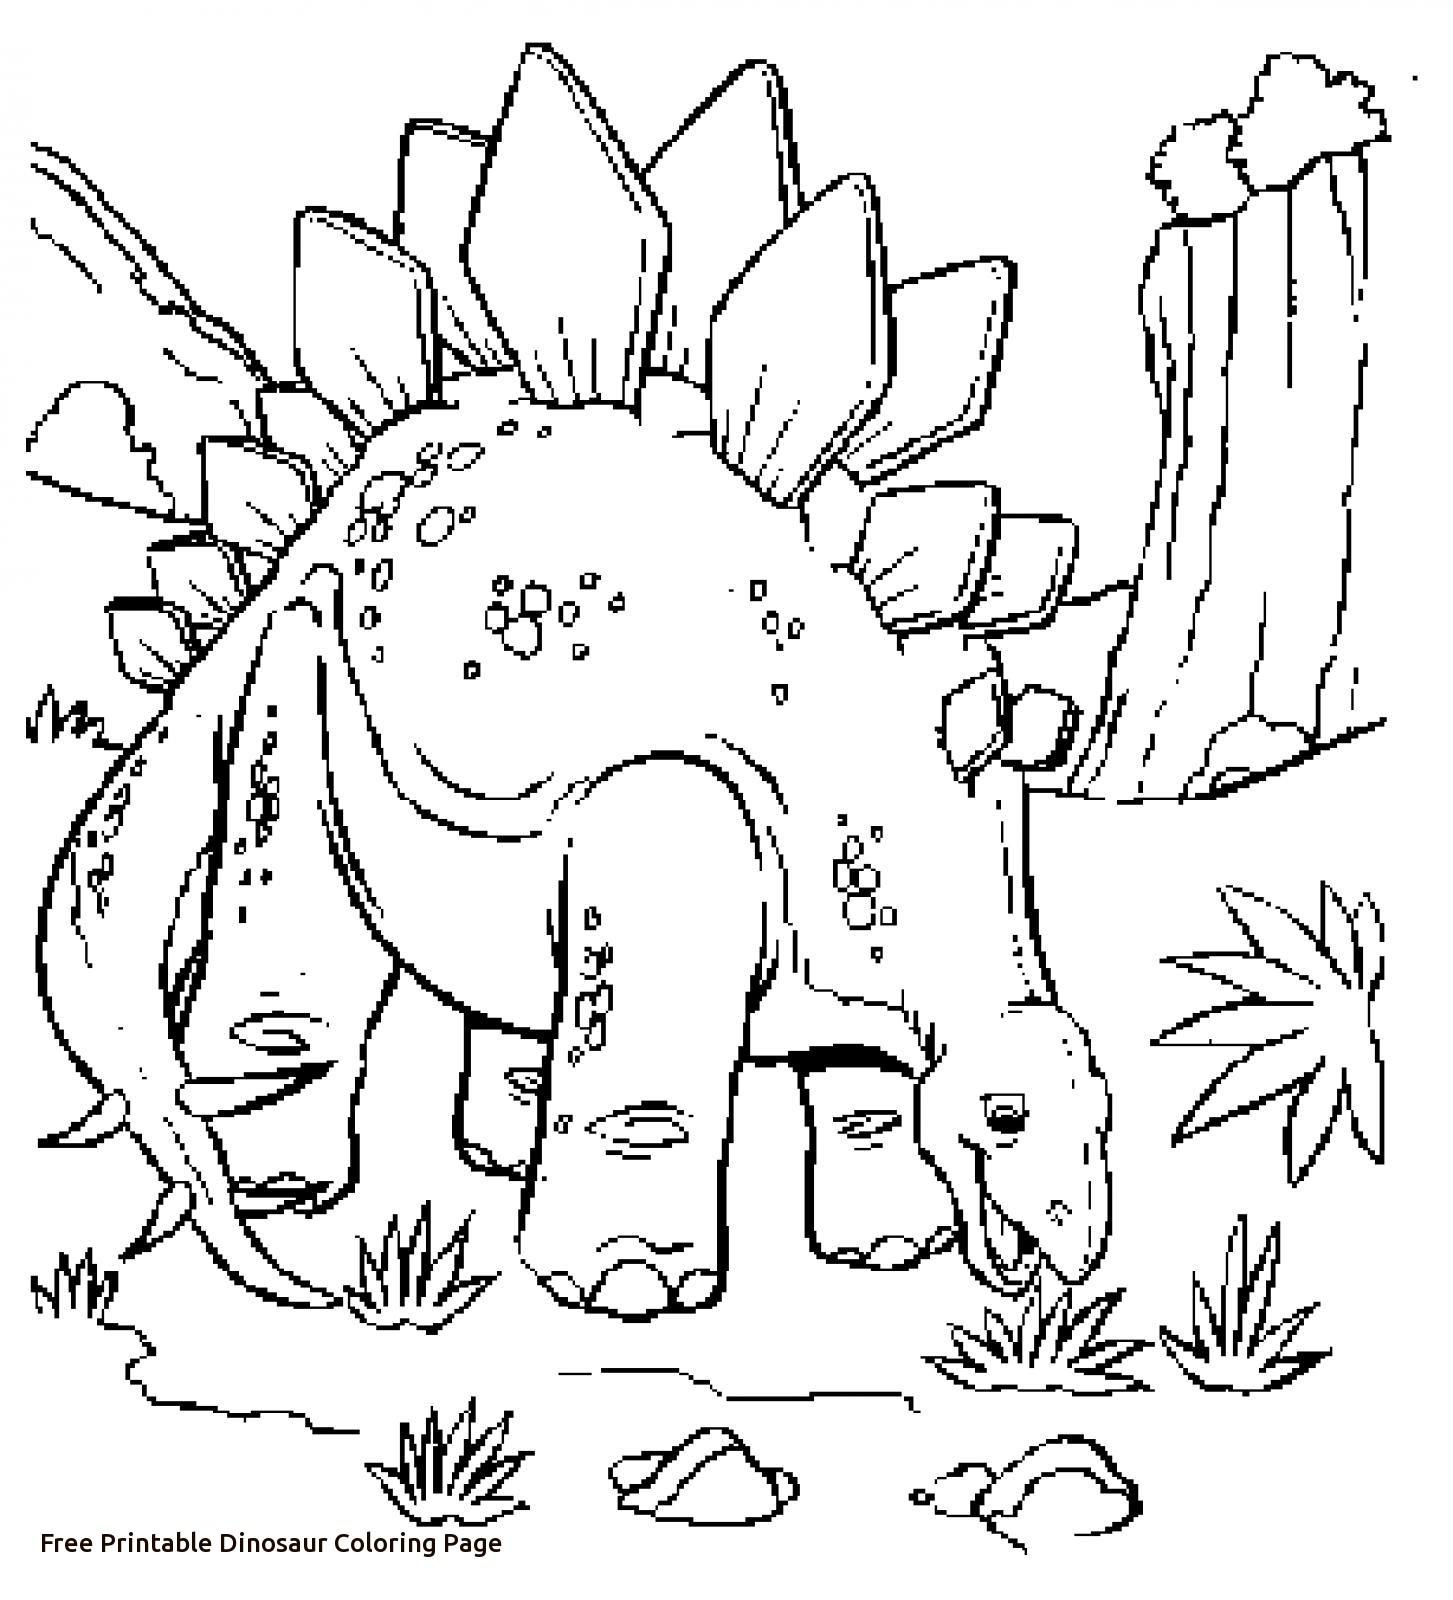 1453x1600 Printable Dinosaur Coloring Pages Unique Free